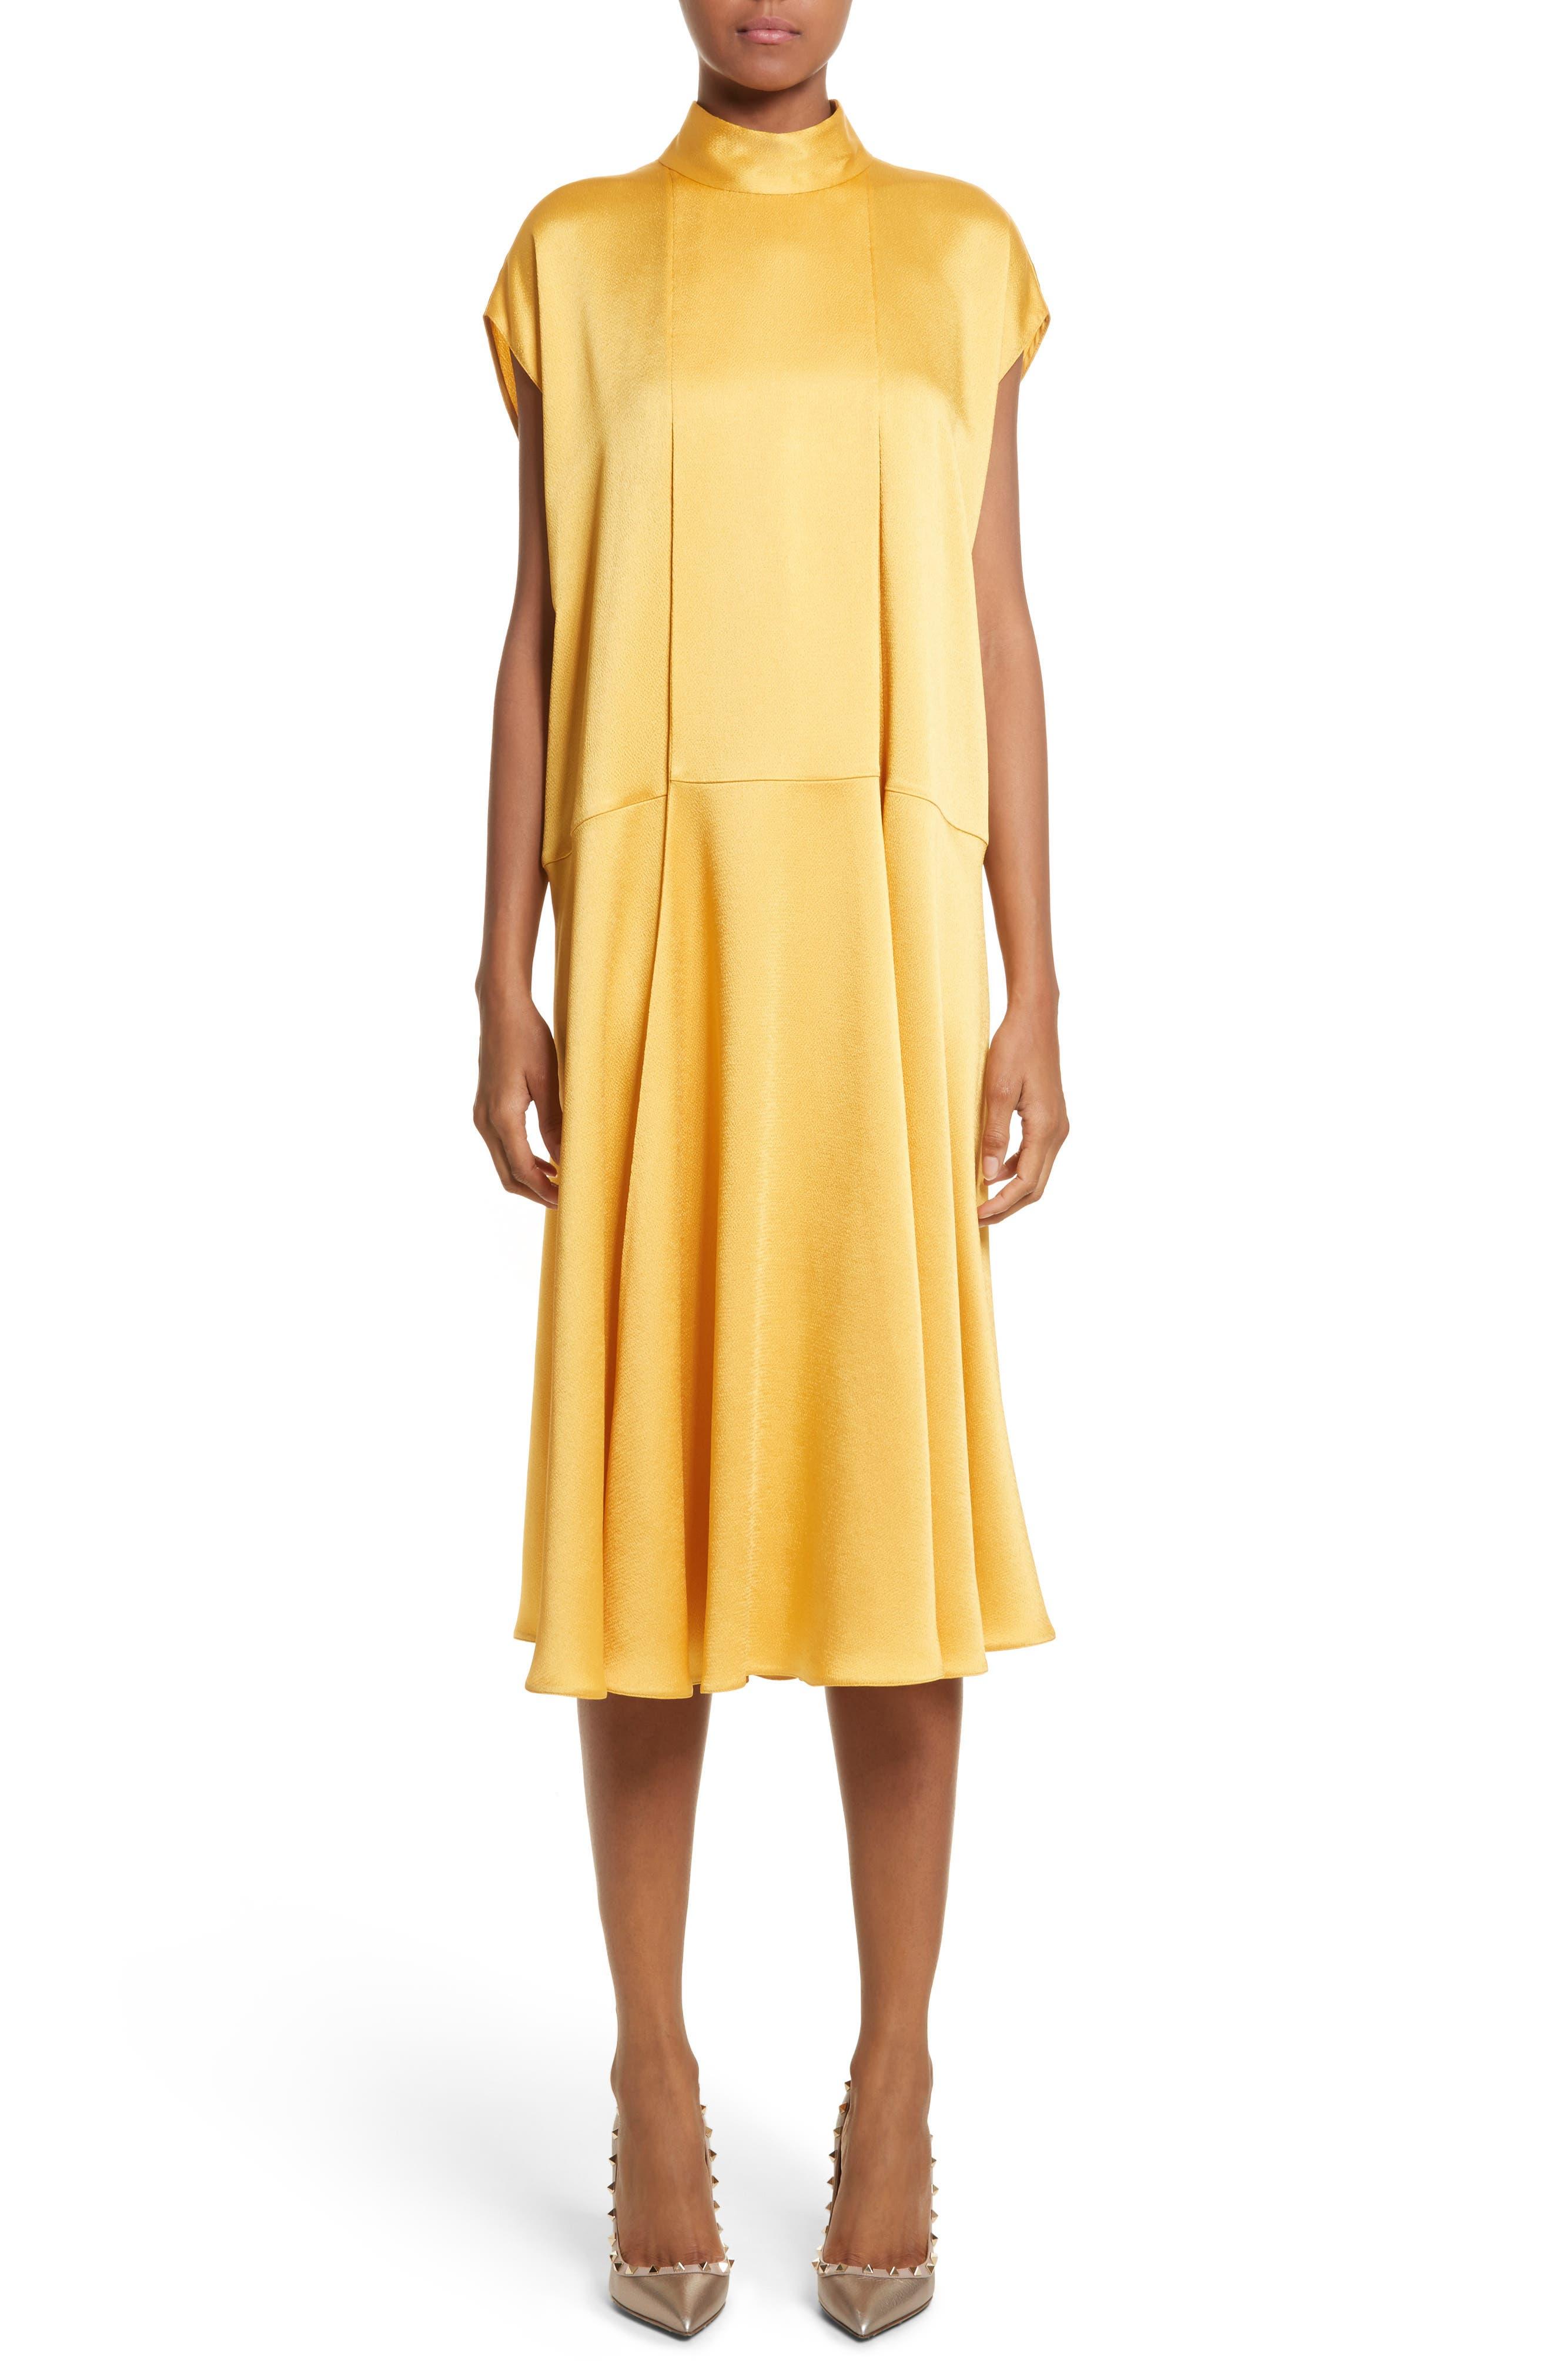 Hammered Satin Midi Dress,                             Main thumbnail 1, color,                             Canary Yellow